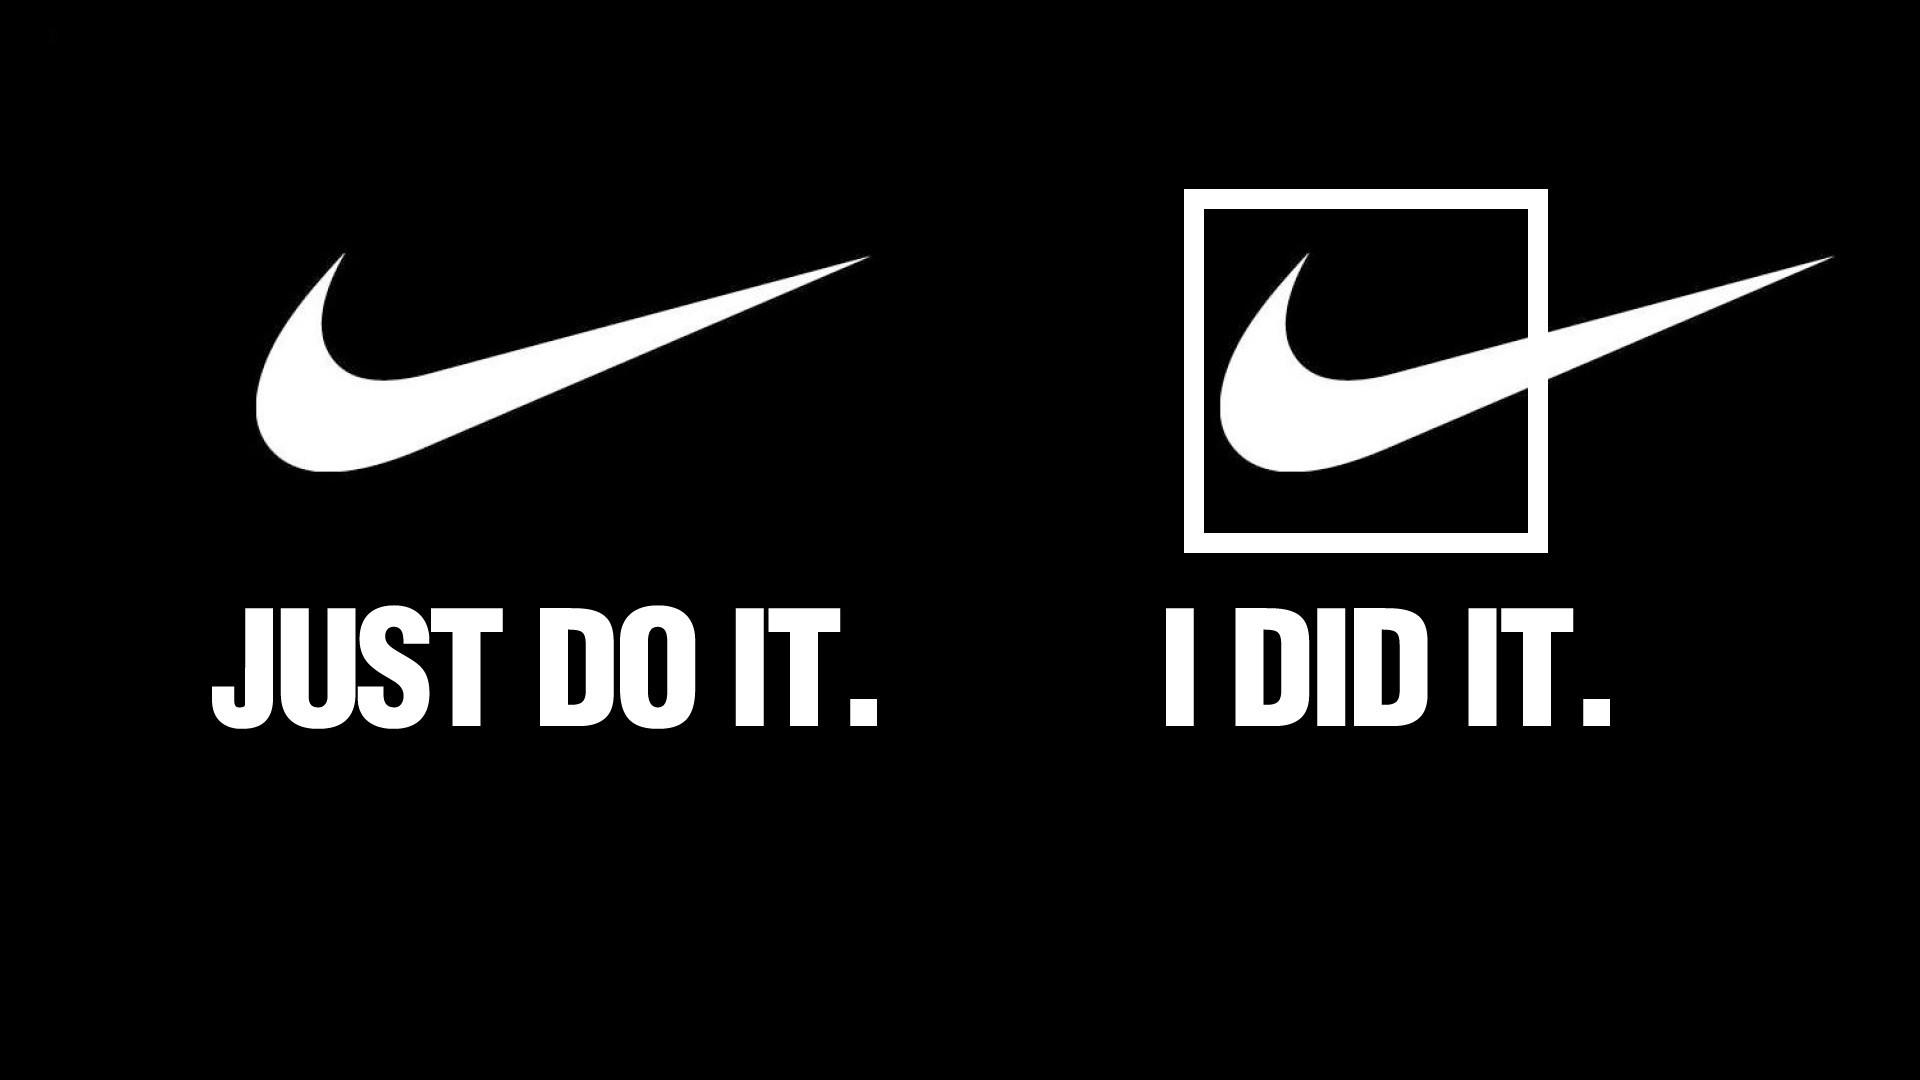 Golpe fuerte Metro Desfavorable  Fondos de pantalla : Nike, humor, Obra de arte, texto, logo, marca, tarea,  línea, fuente 1920x1080 - Jeko98 - 93823 - Fondos de pantalla - WallHere